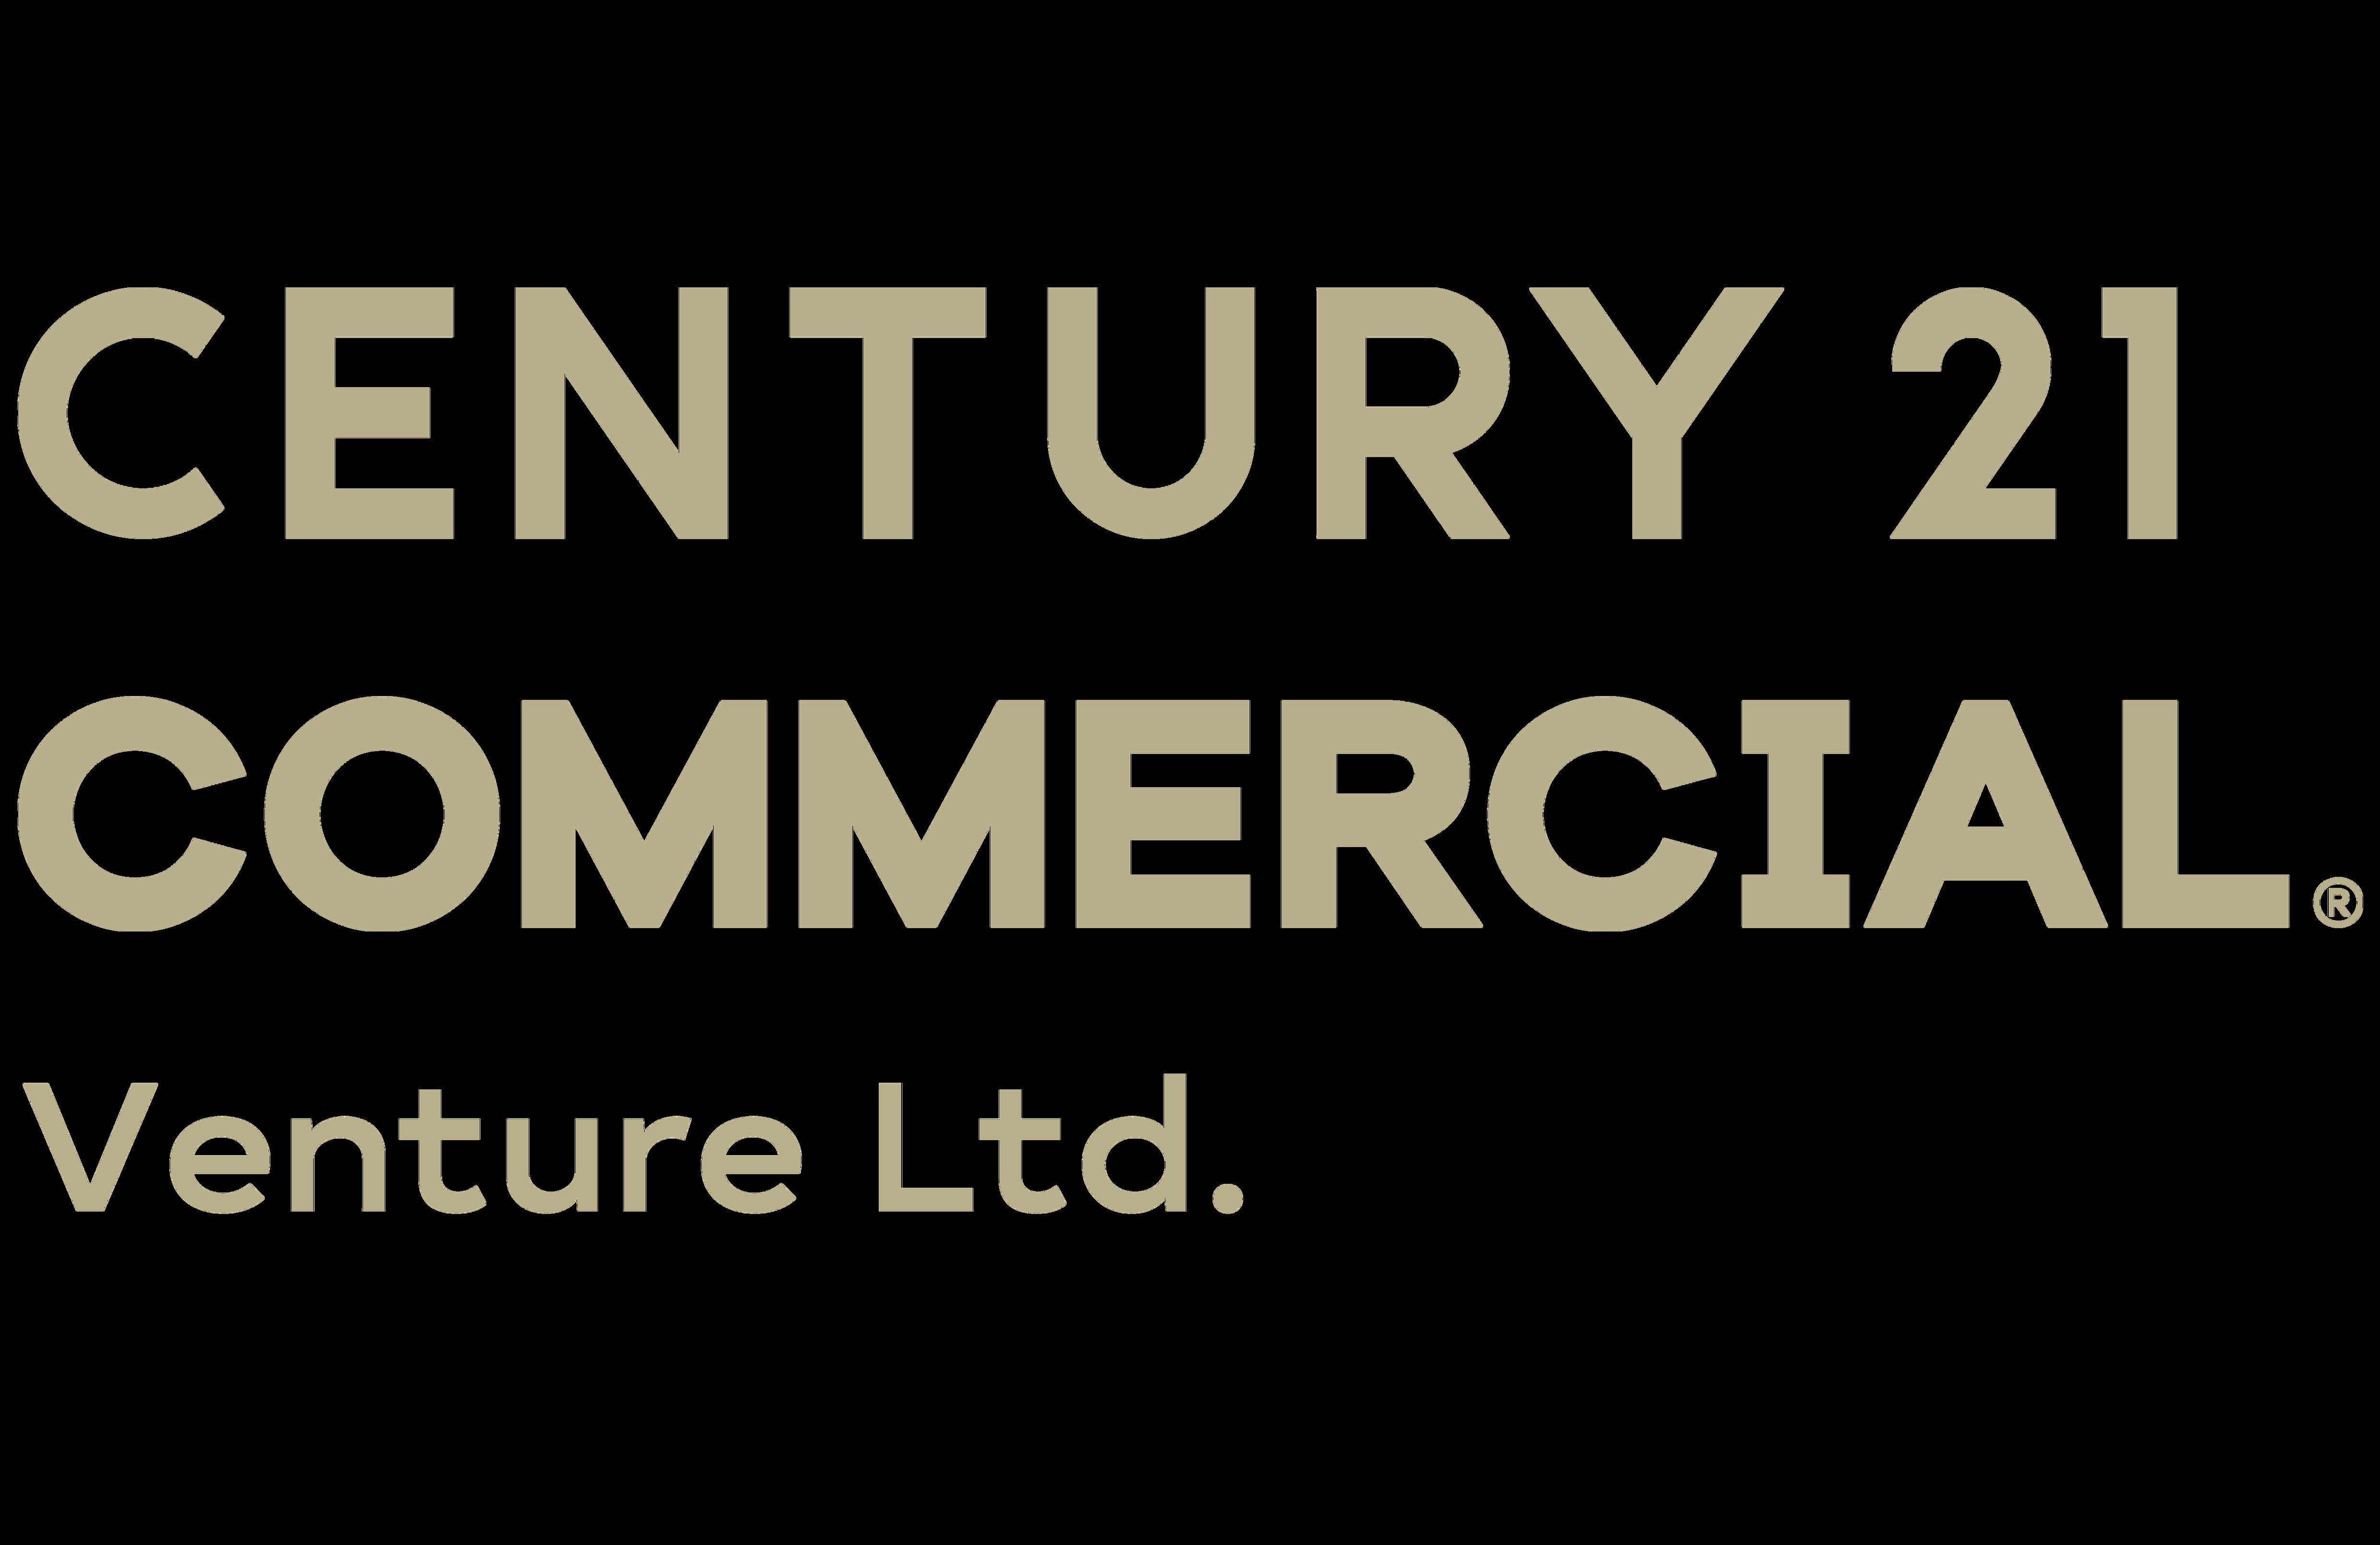 Bruce Holmes of CENTURY 21 Venture Ltd. logo